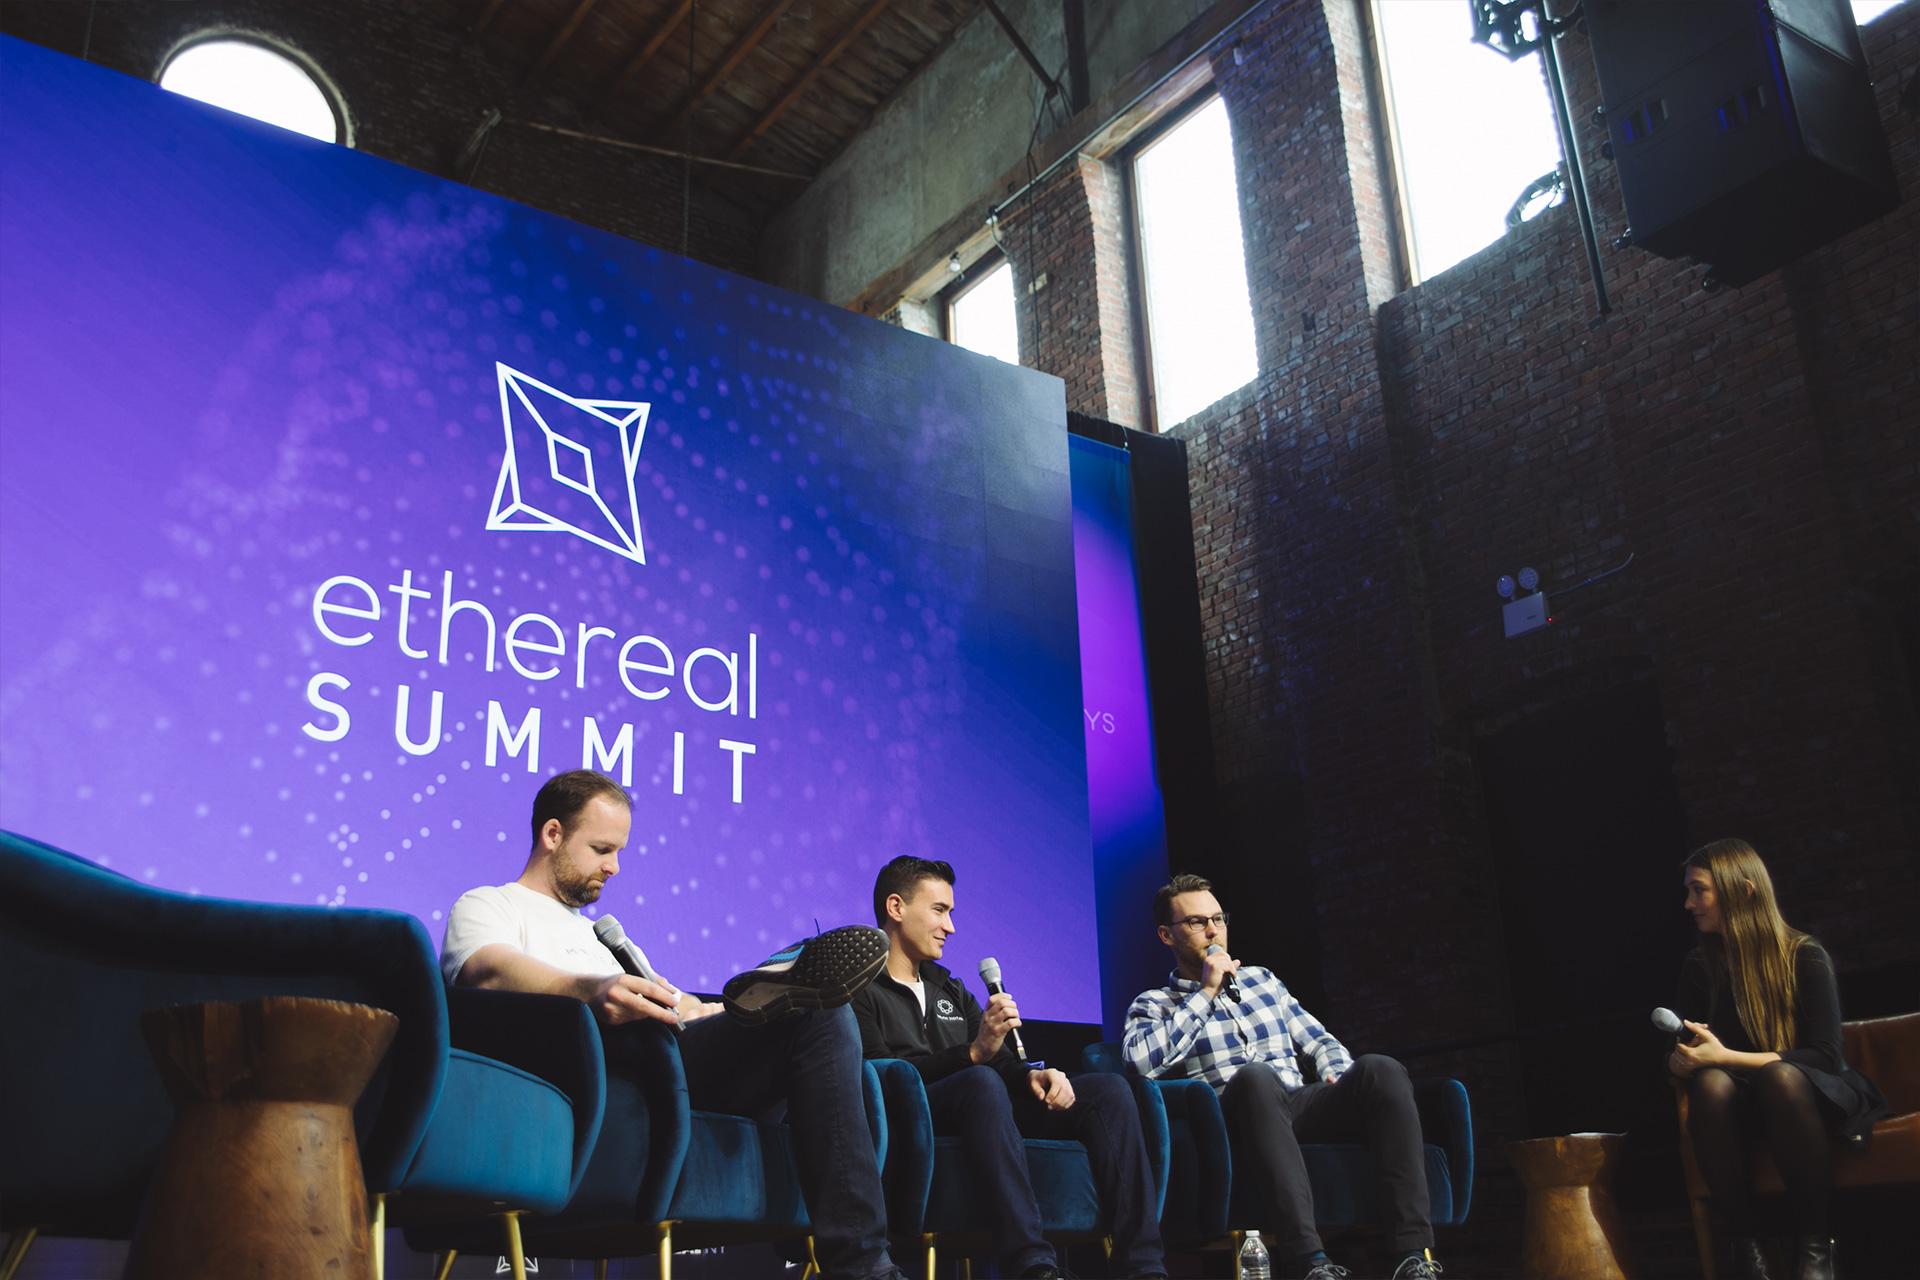 Ethereal Summit New York 2019 @ Pioneer Works